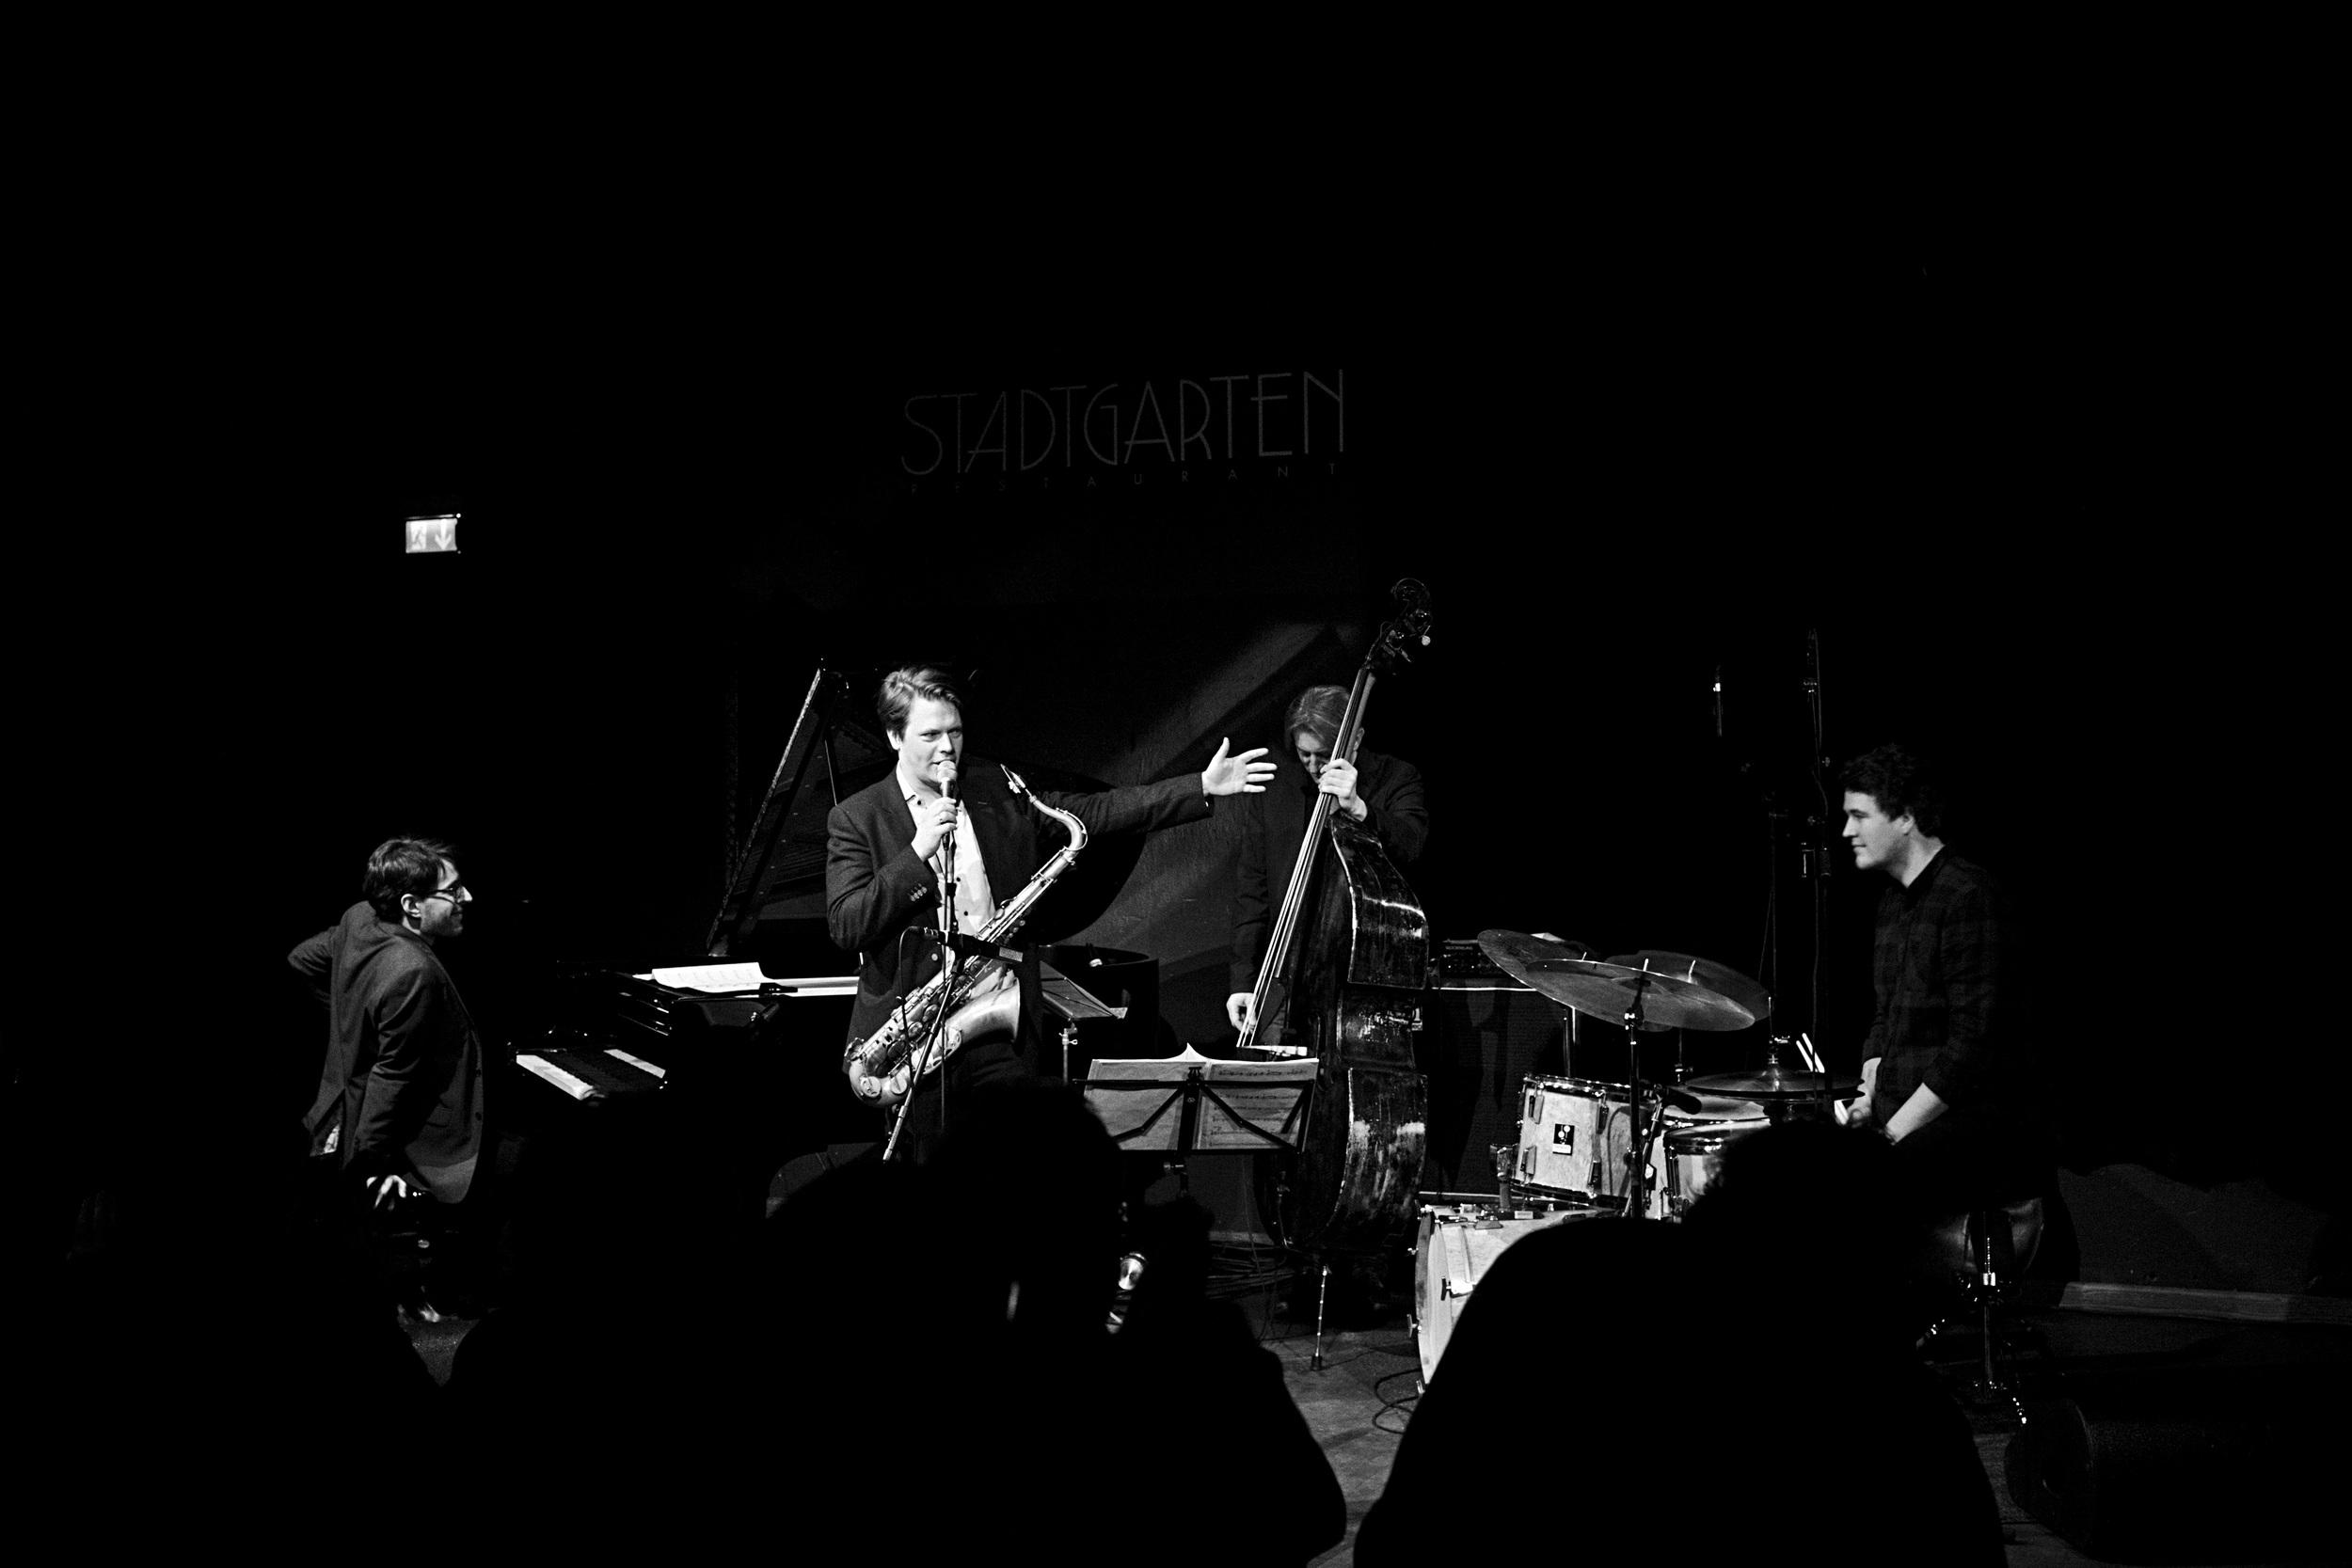 fabian stuertz 2016.02.28 - denis gäbel quartet - stadtgarten 0044-bw.jpg